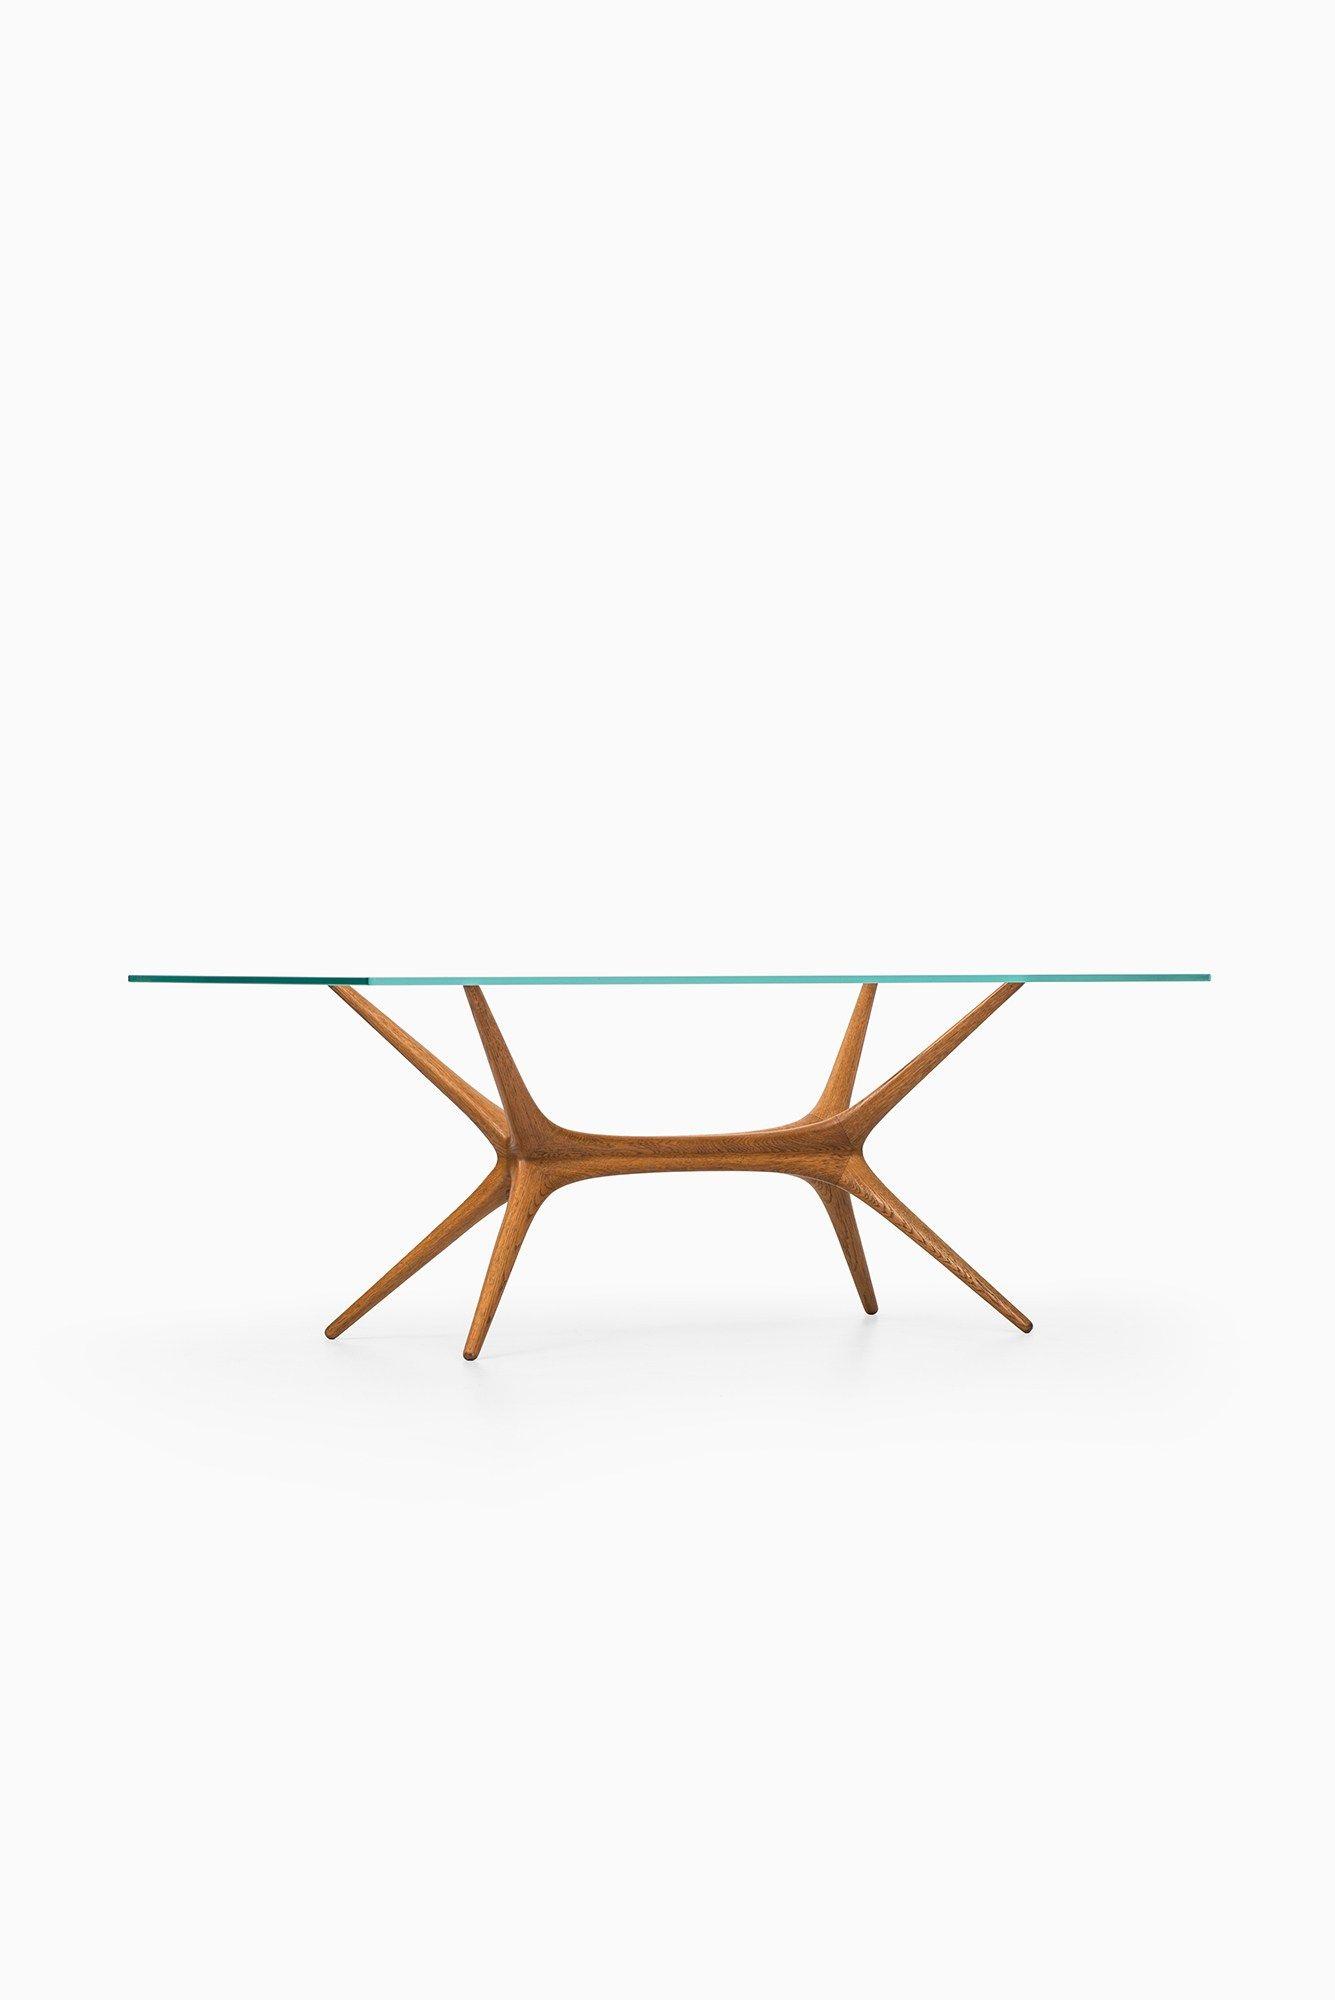 Tapio Wirkkala Coffee Table Studio Schalling Modern Retro Furniture Scandinavian Design Mid Century Design [ 2000 x 1335 Pixel ]